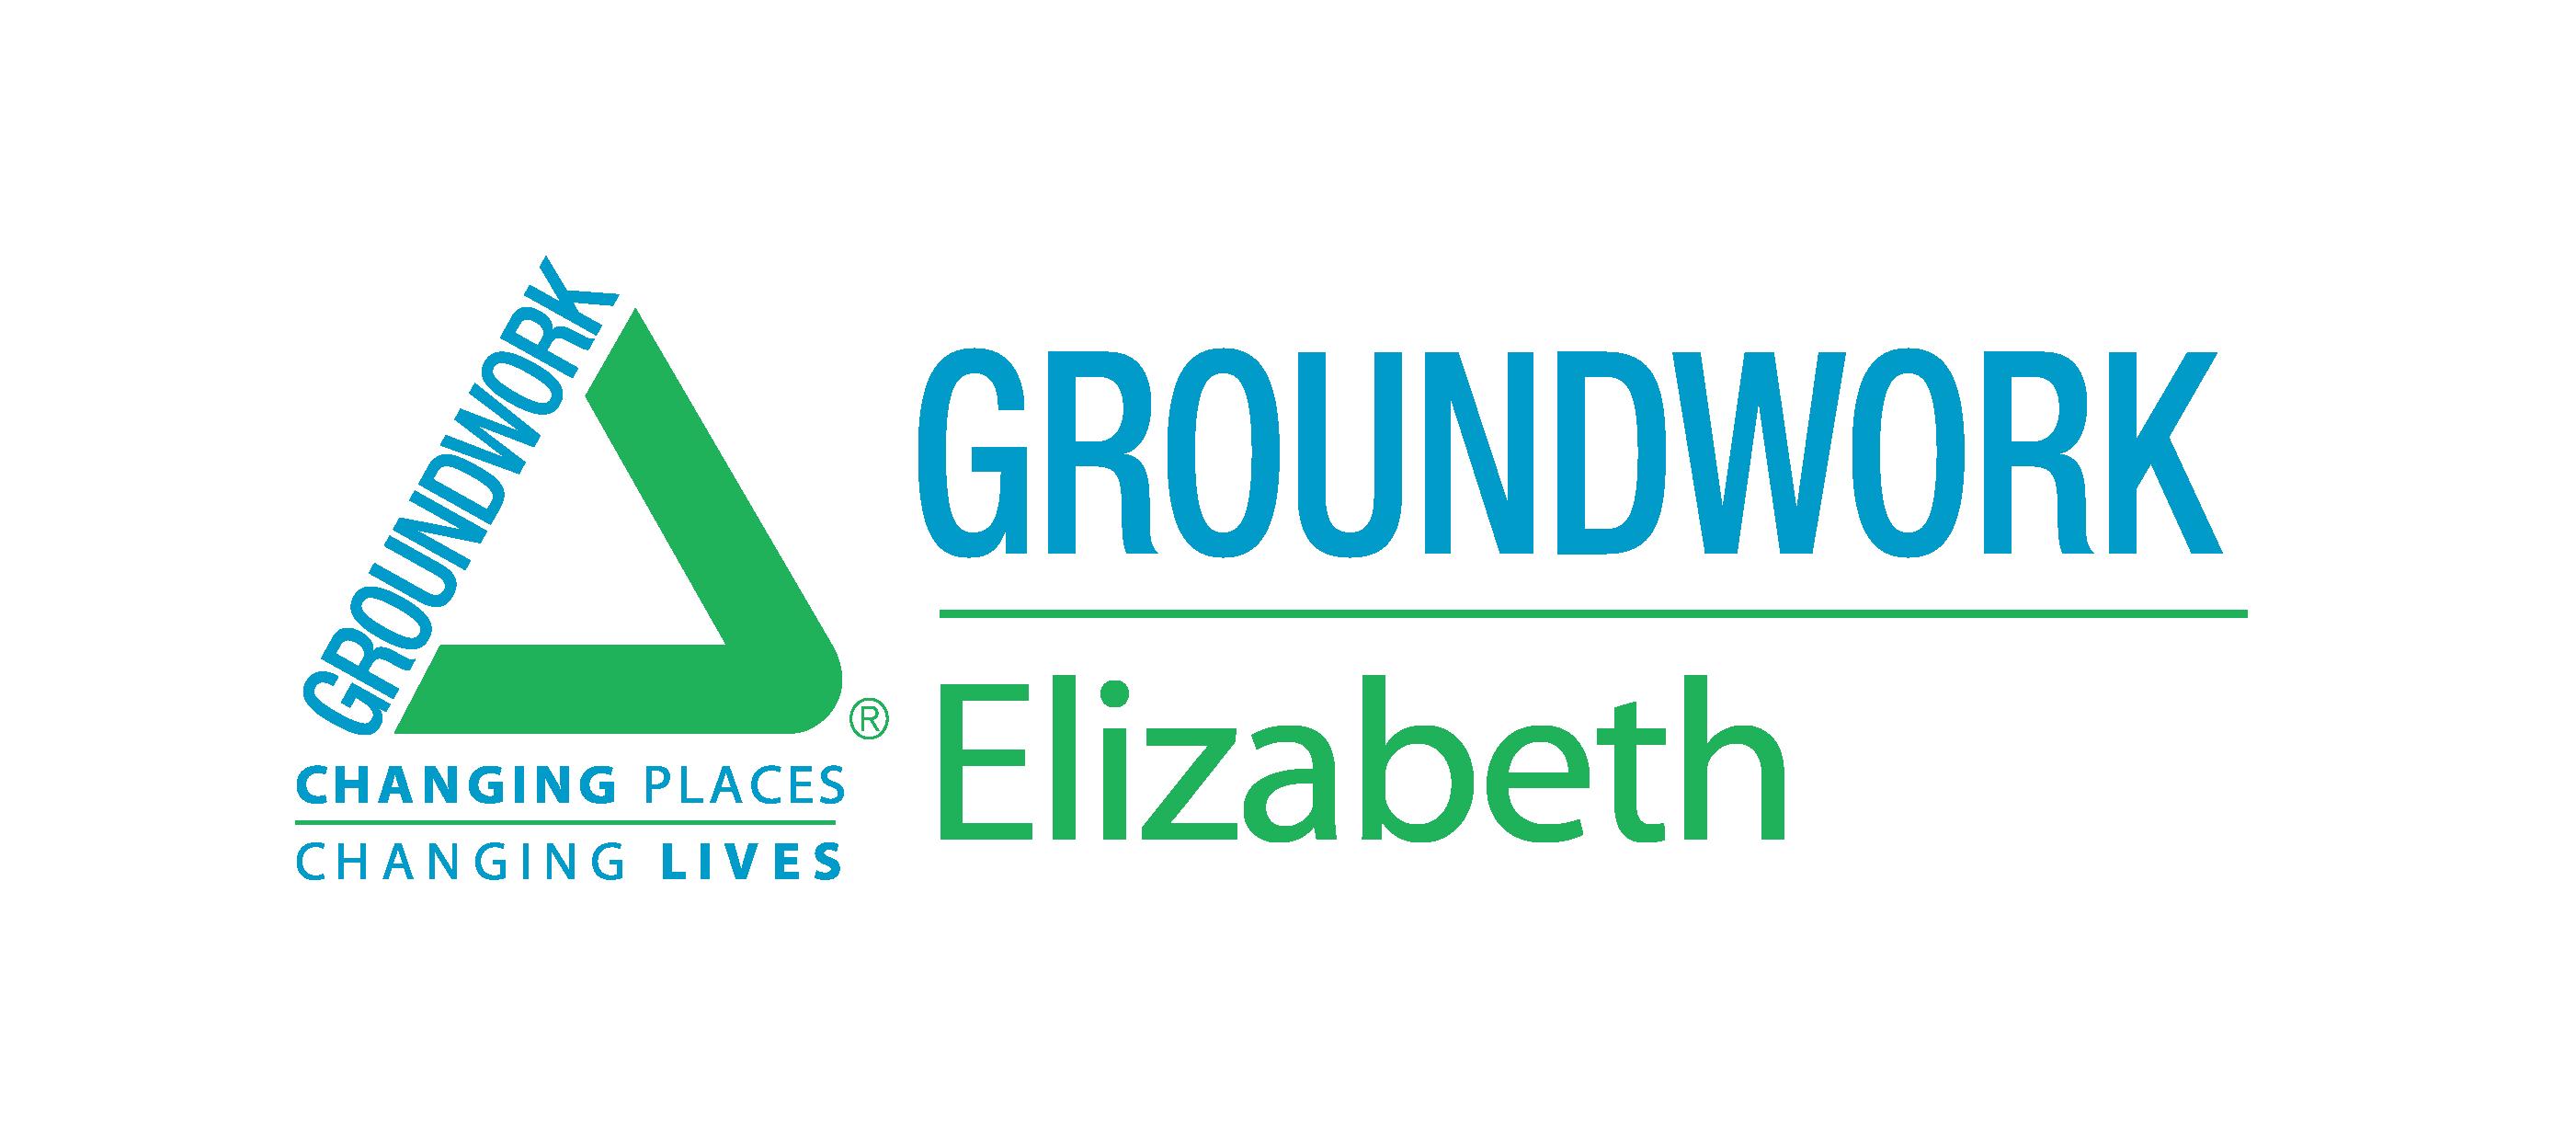 Groundwork Elizabeth